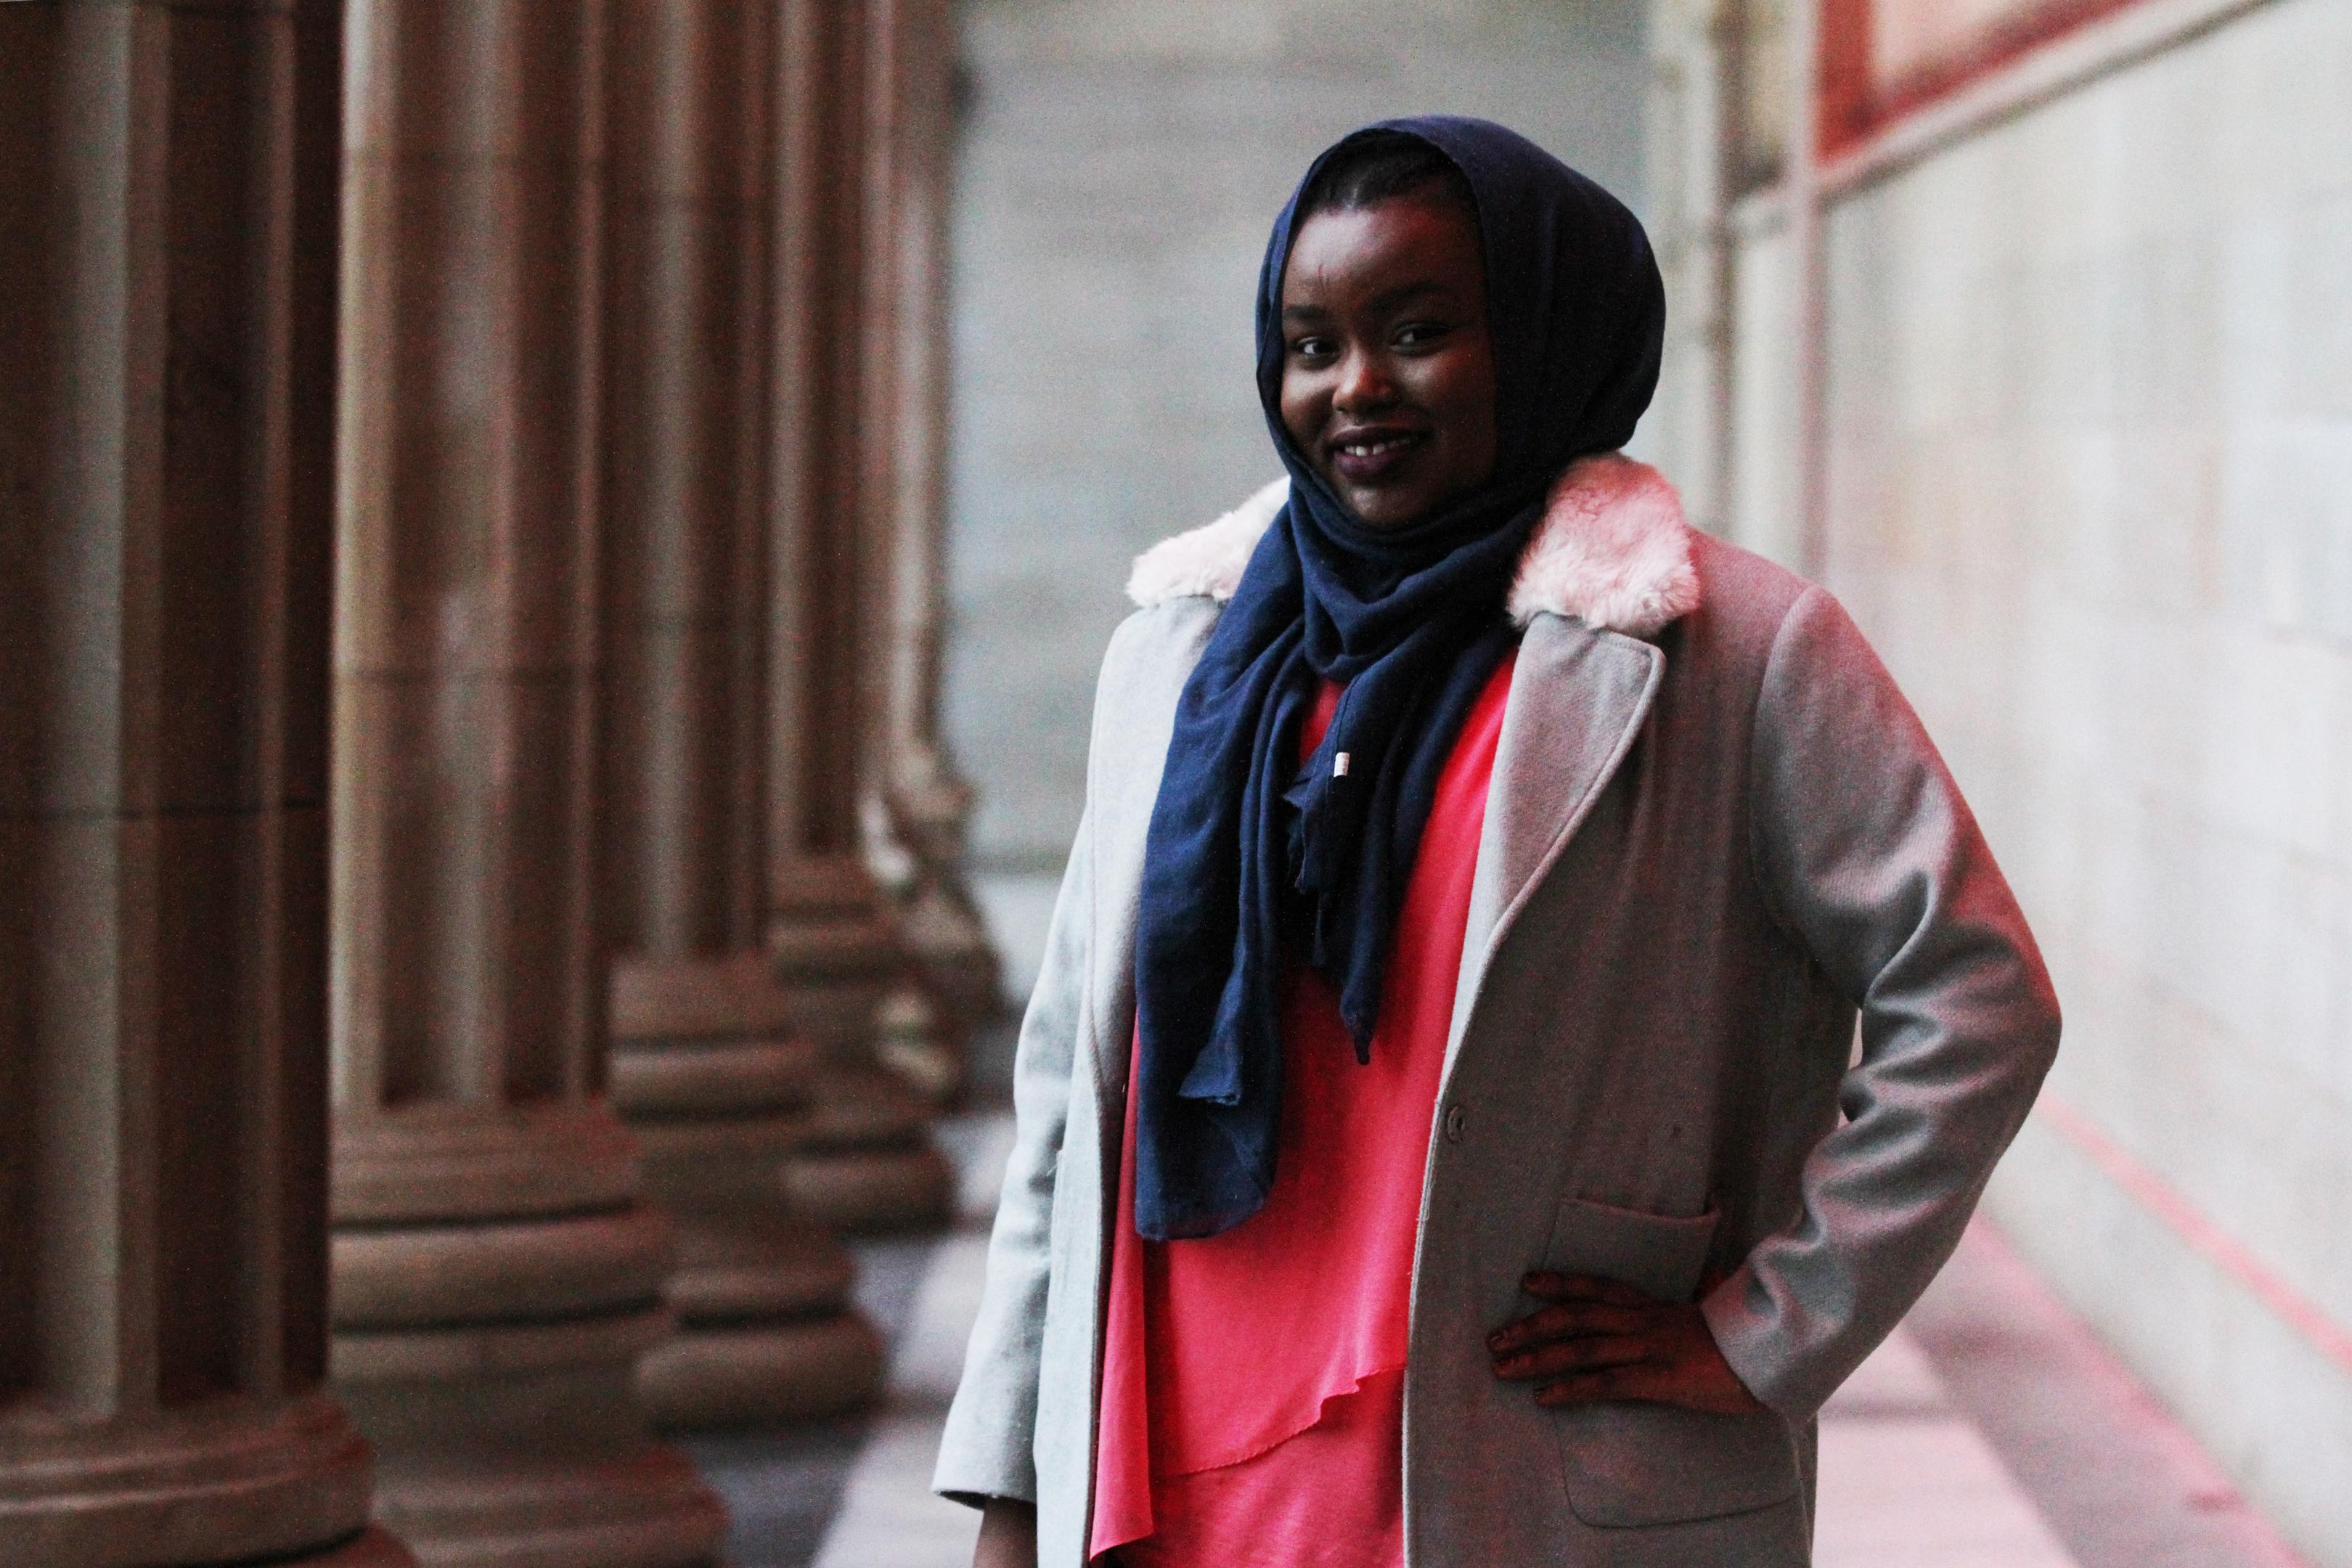 Ameena Deeni, 18, battled Bulimia for many years